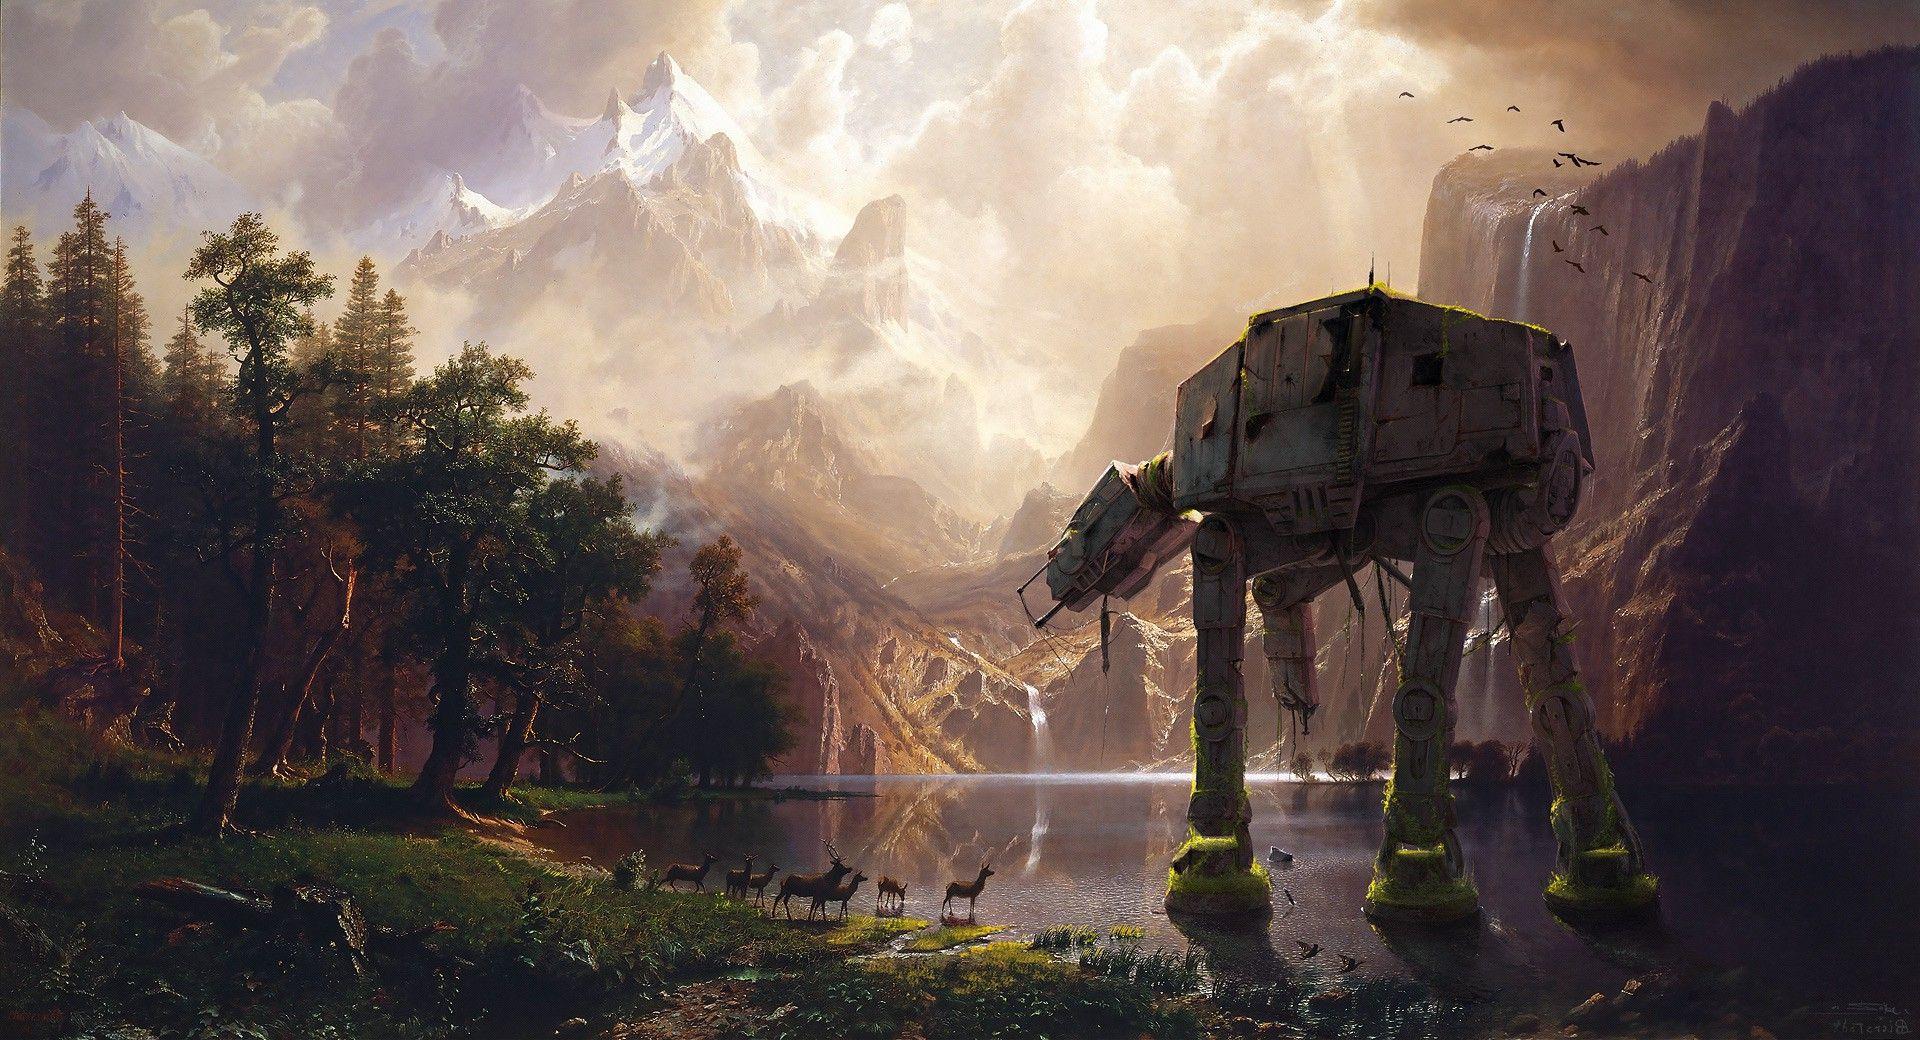 Hd Star Wars Wallpaper Download Hd Wallpapers Of 170477 Star Wars Free Download High Quality Star Wars Background Star Wars Wallpaper Landscape Wallpaper